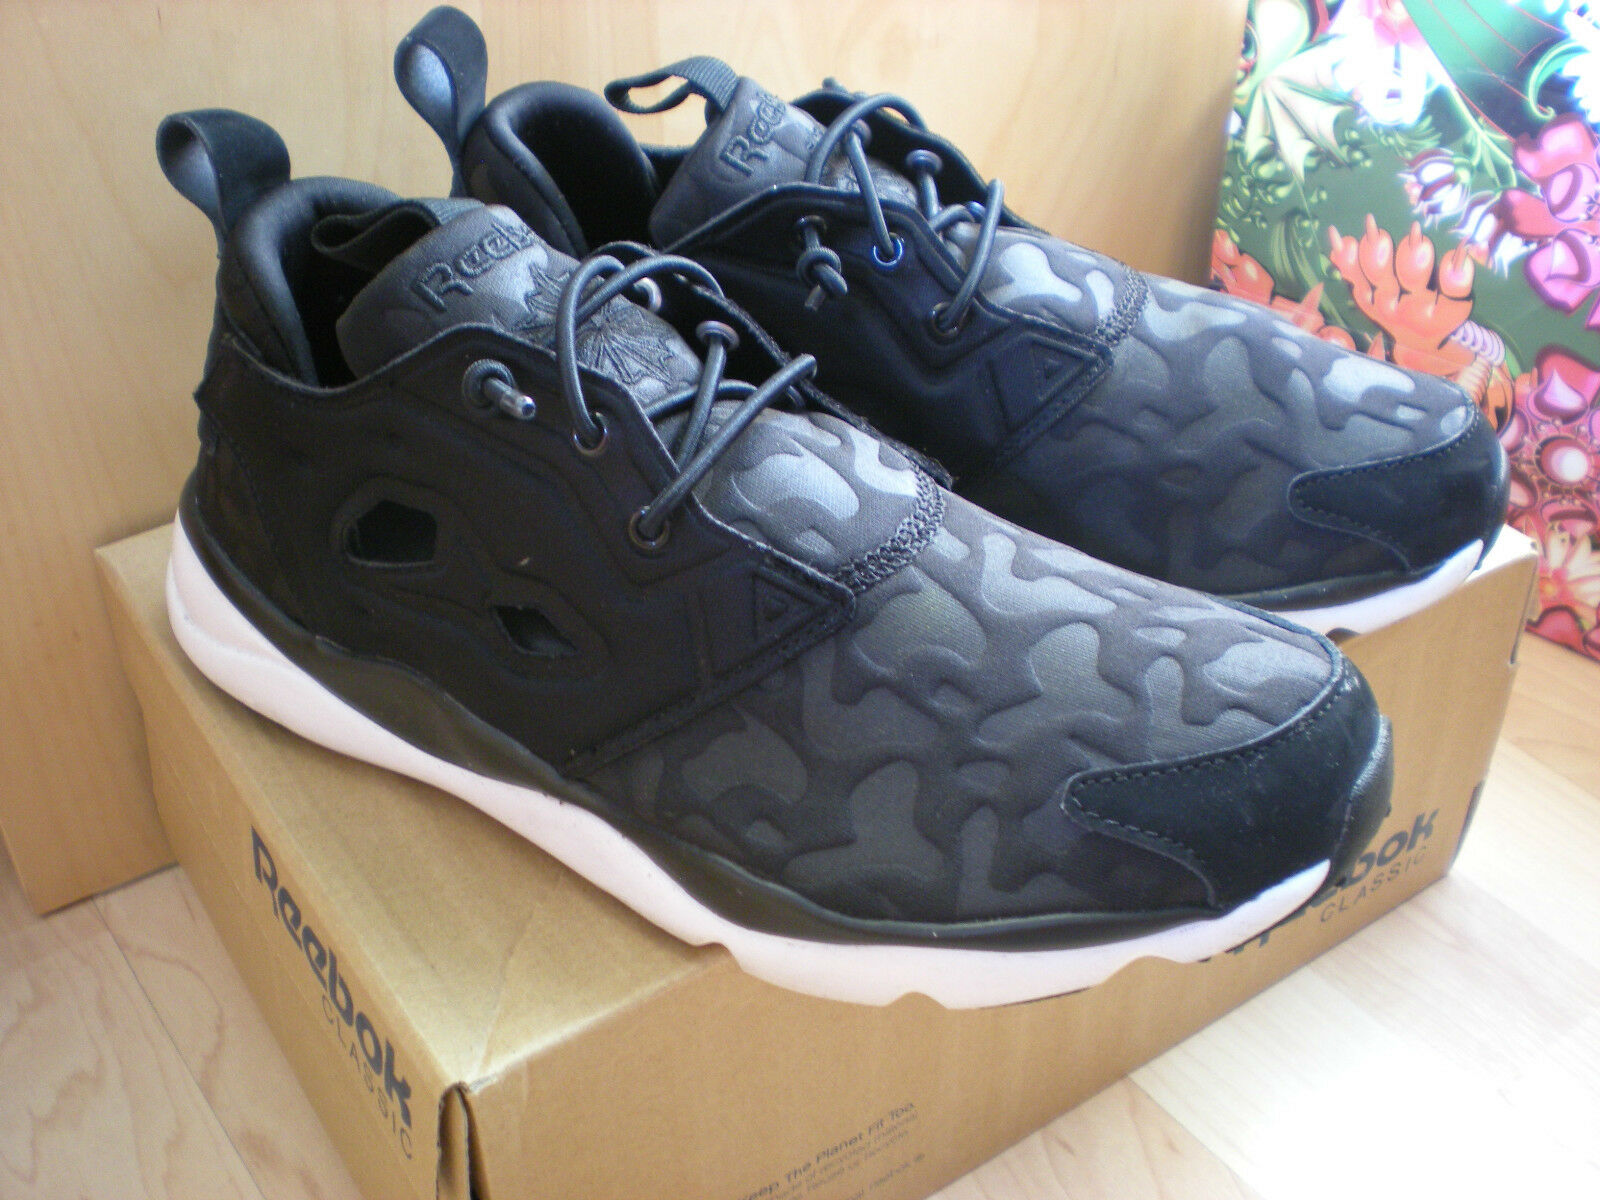 REEBOK FURY LITE Black Graphic Concrete Trainers  Size 5 UK NEW